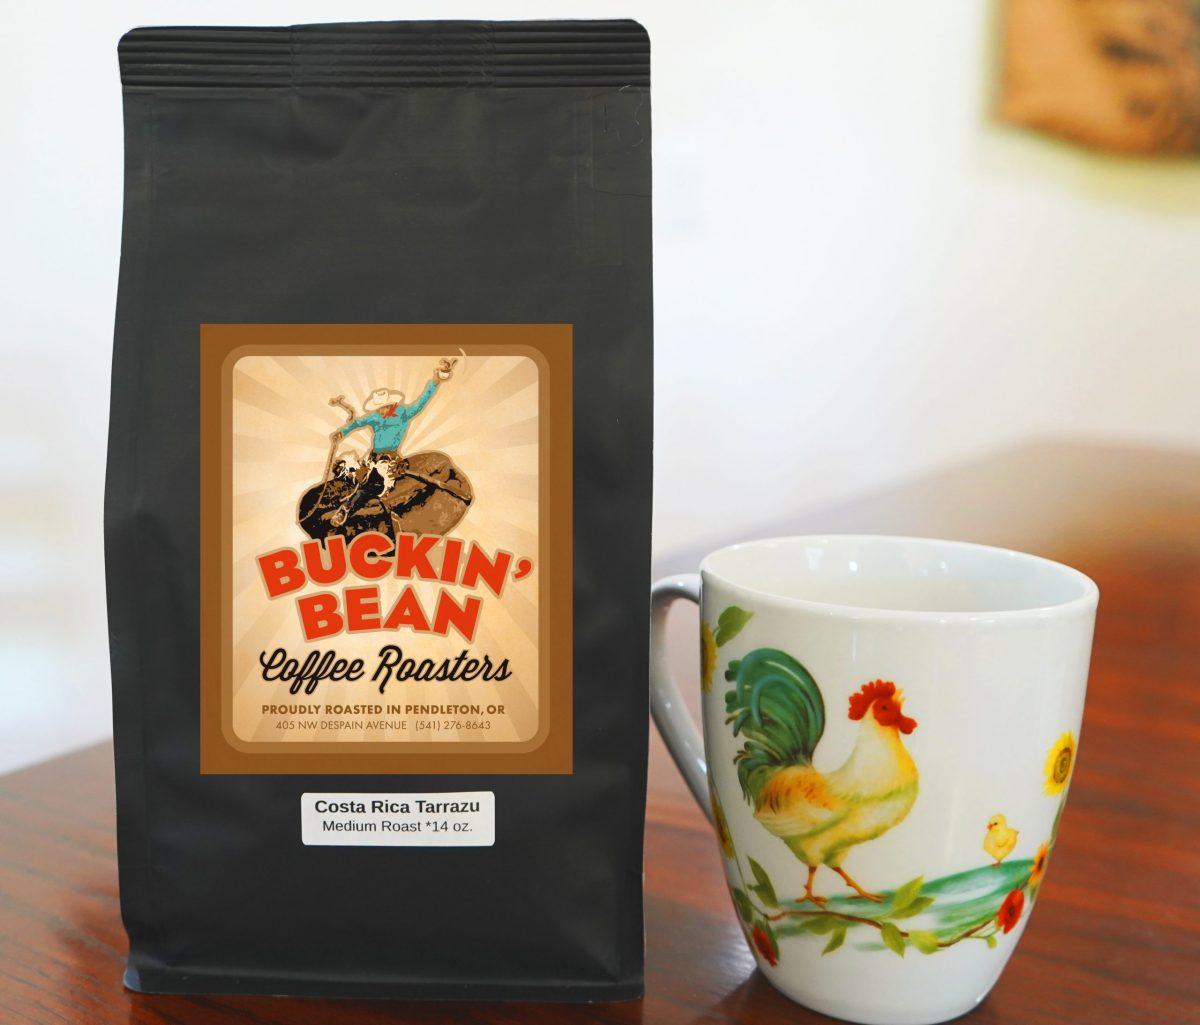 Costa Rican Coffee bag with coffee mug